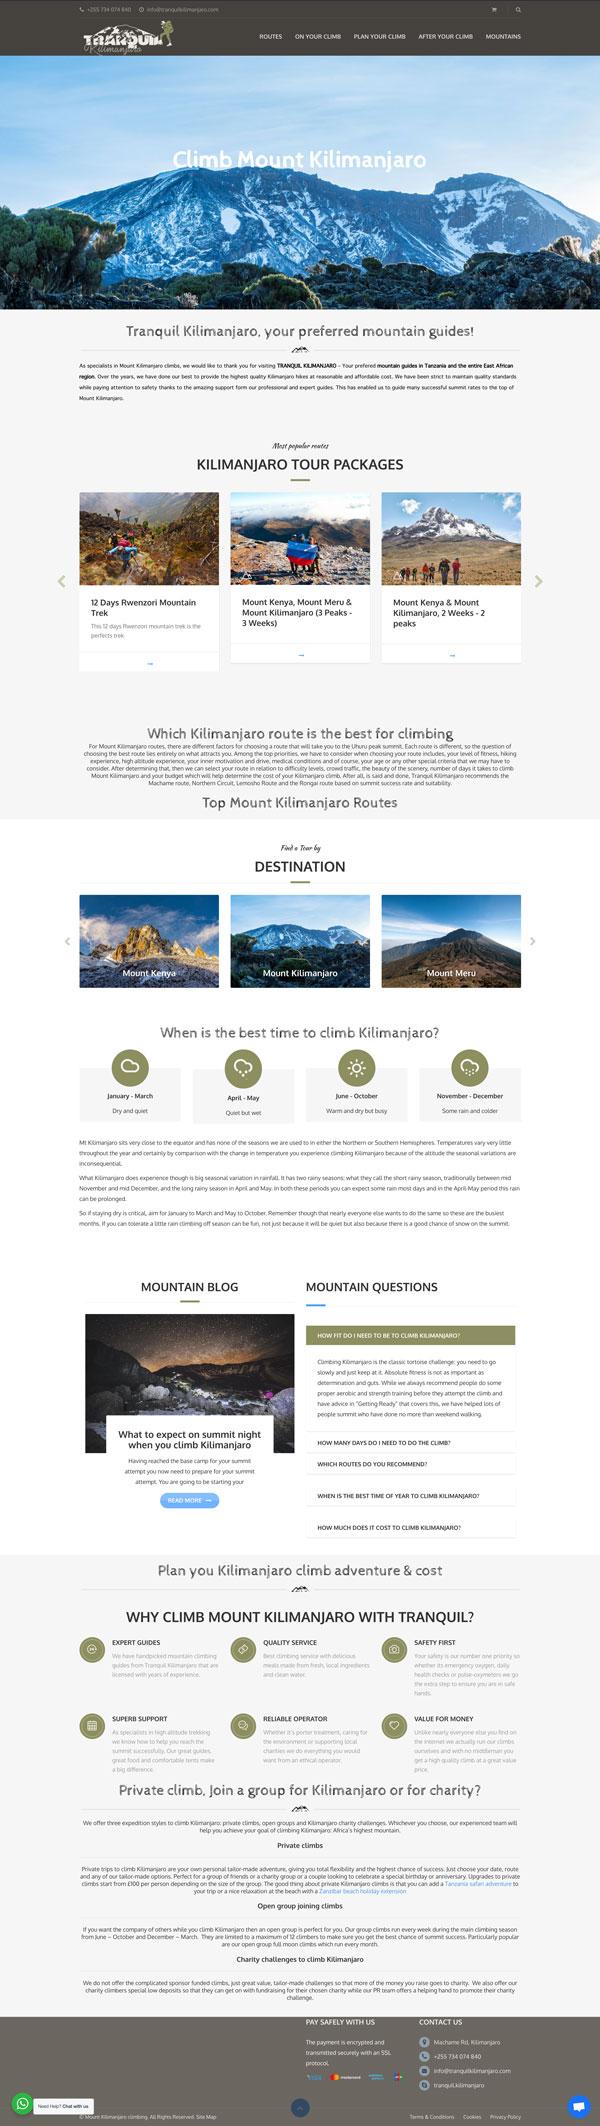 Tranquil Kilimanjaro website